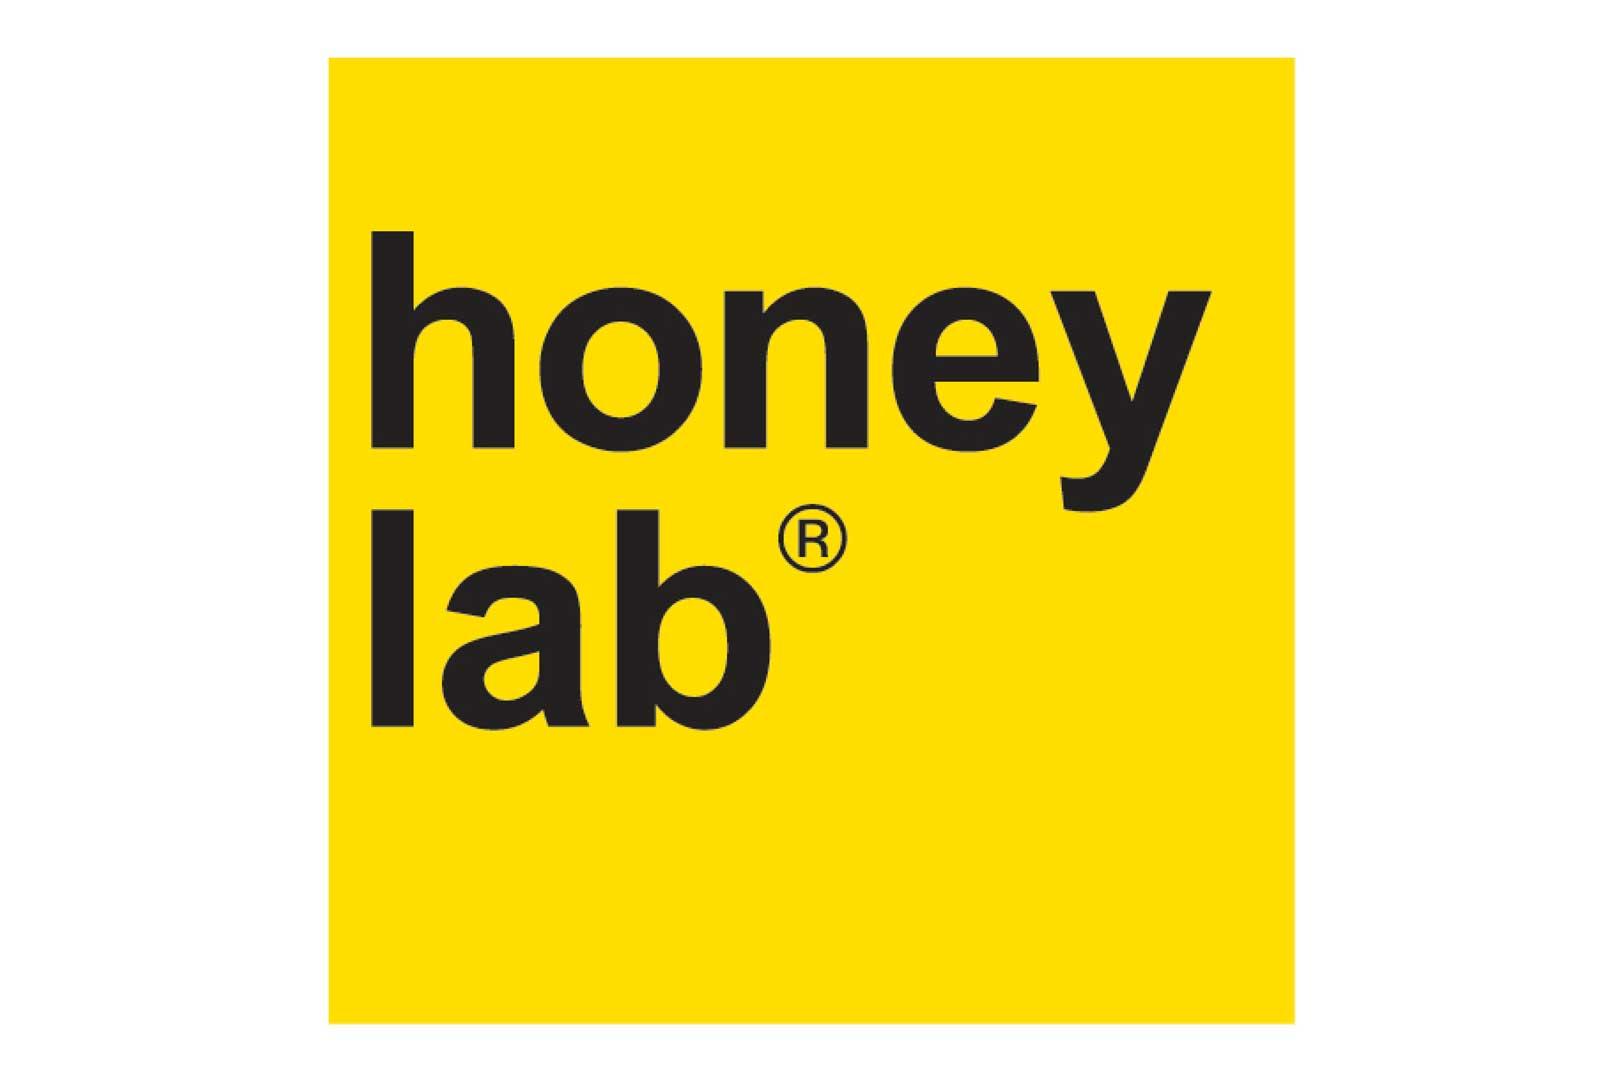 Honeylab